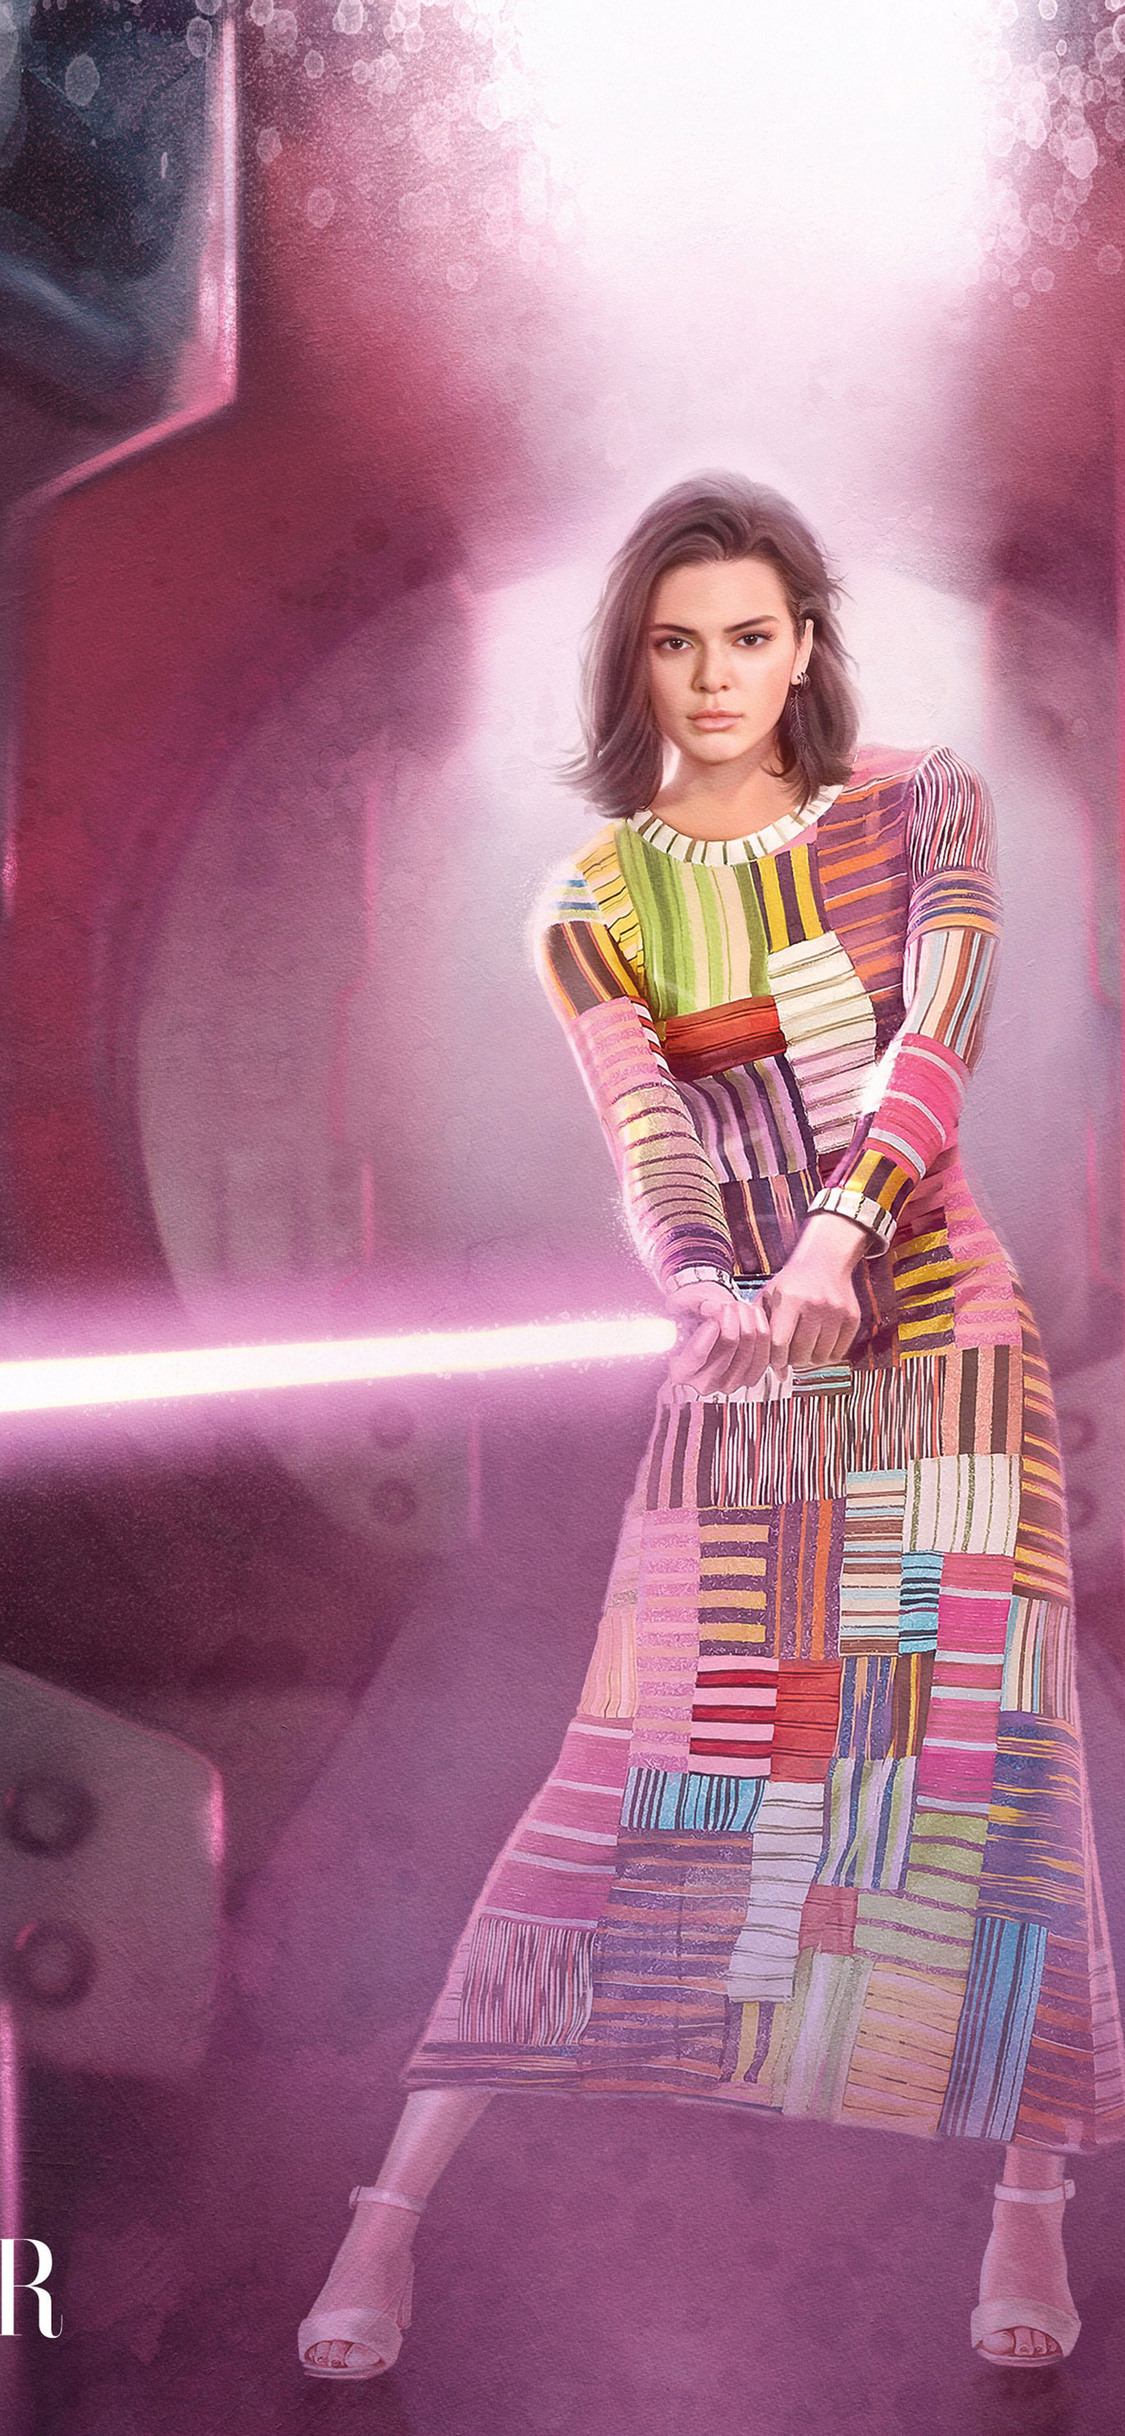 kendall jenner in star wars inspired editorial harper bazaar wm